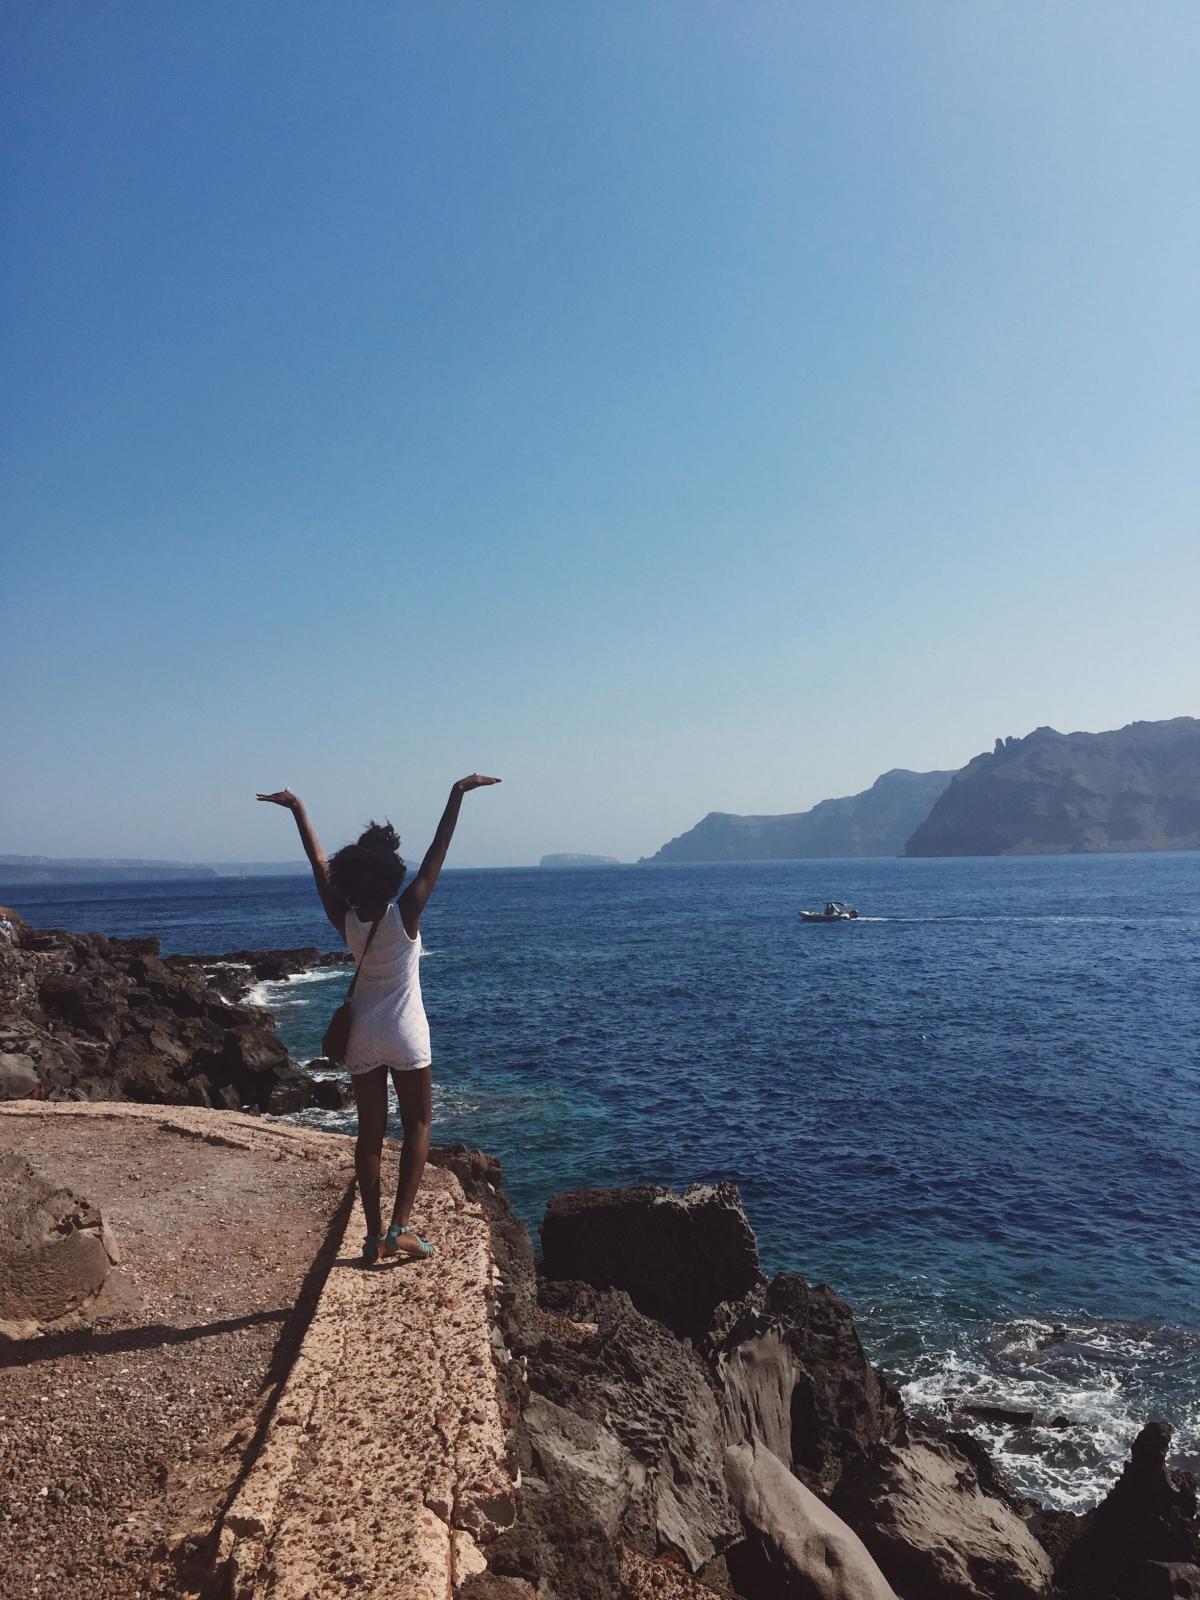 Greece Days 3-5, The Beauty of Santorini and#BlackGirlMagic